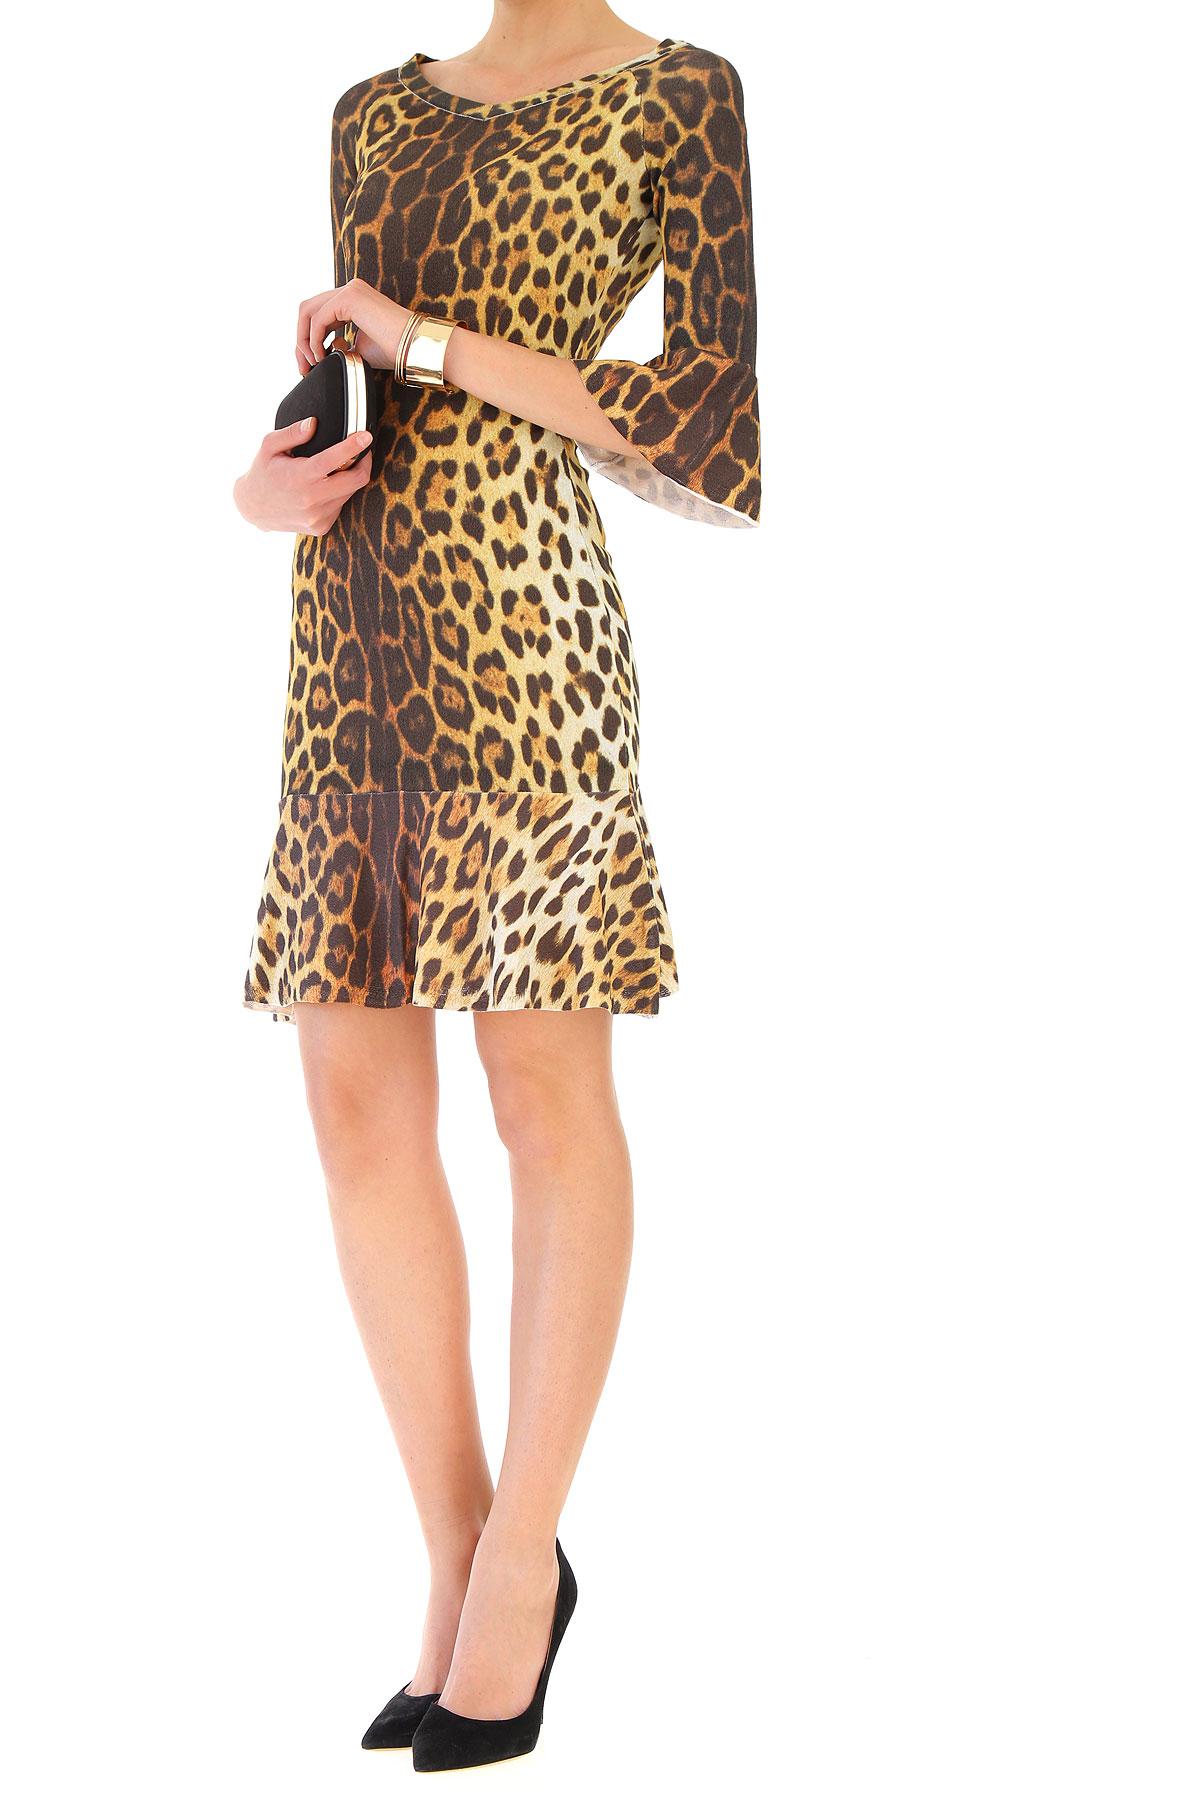 Para Leopardo Moschino Ropa 2019 nbsp; verano Primavera Mujer 5AAwqP